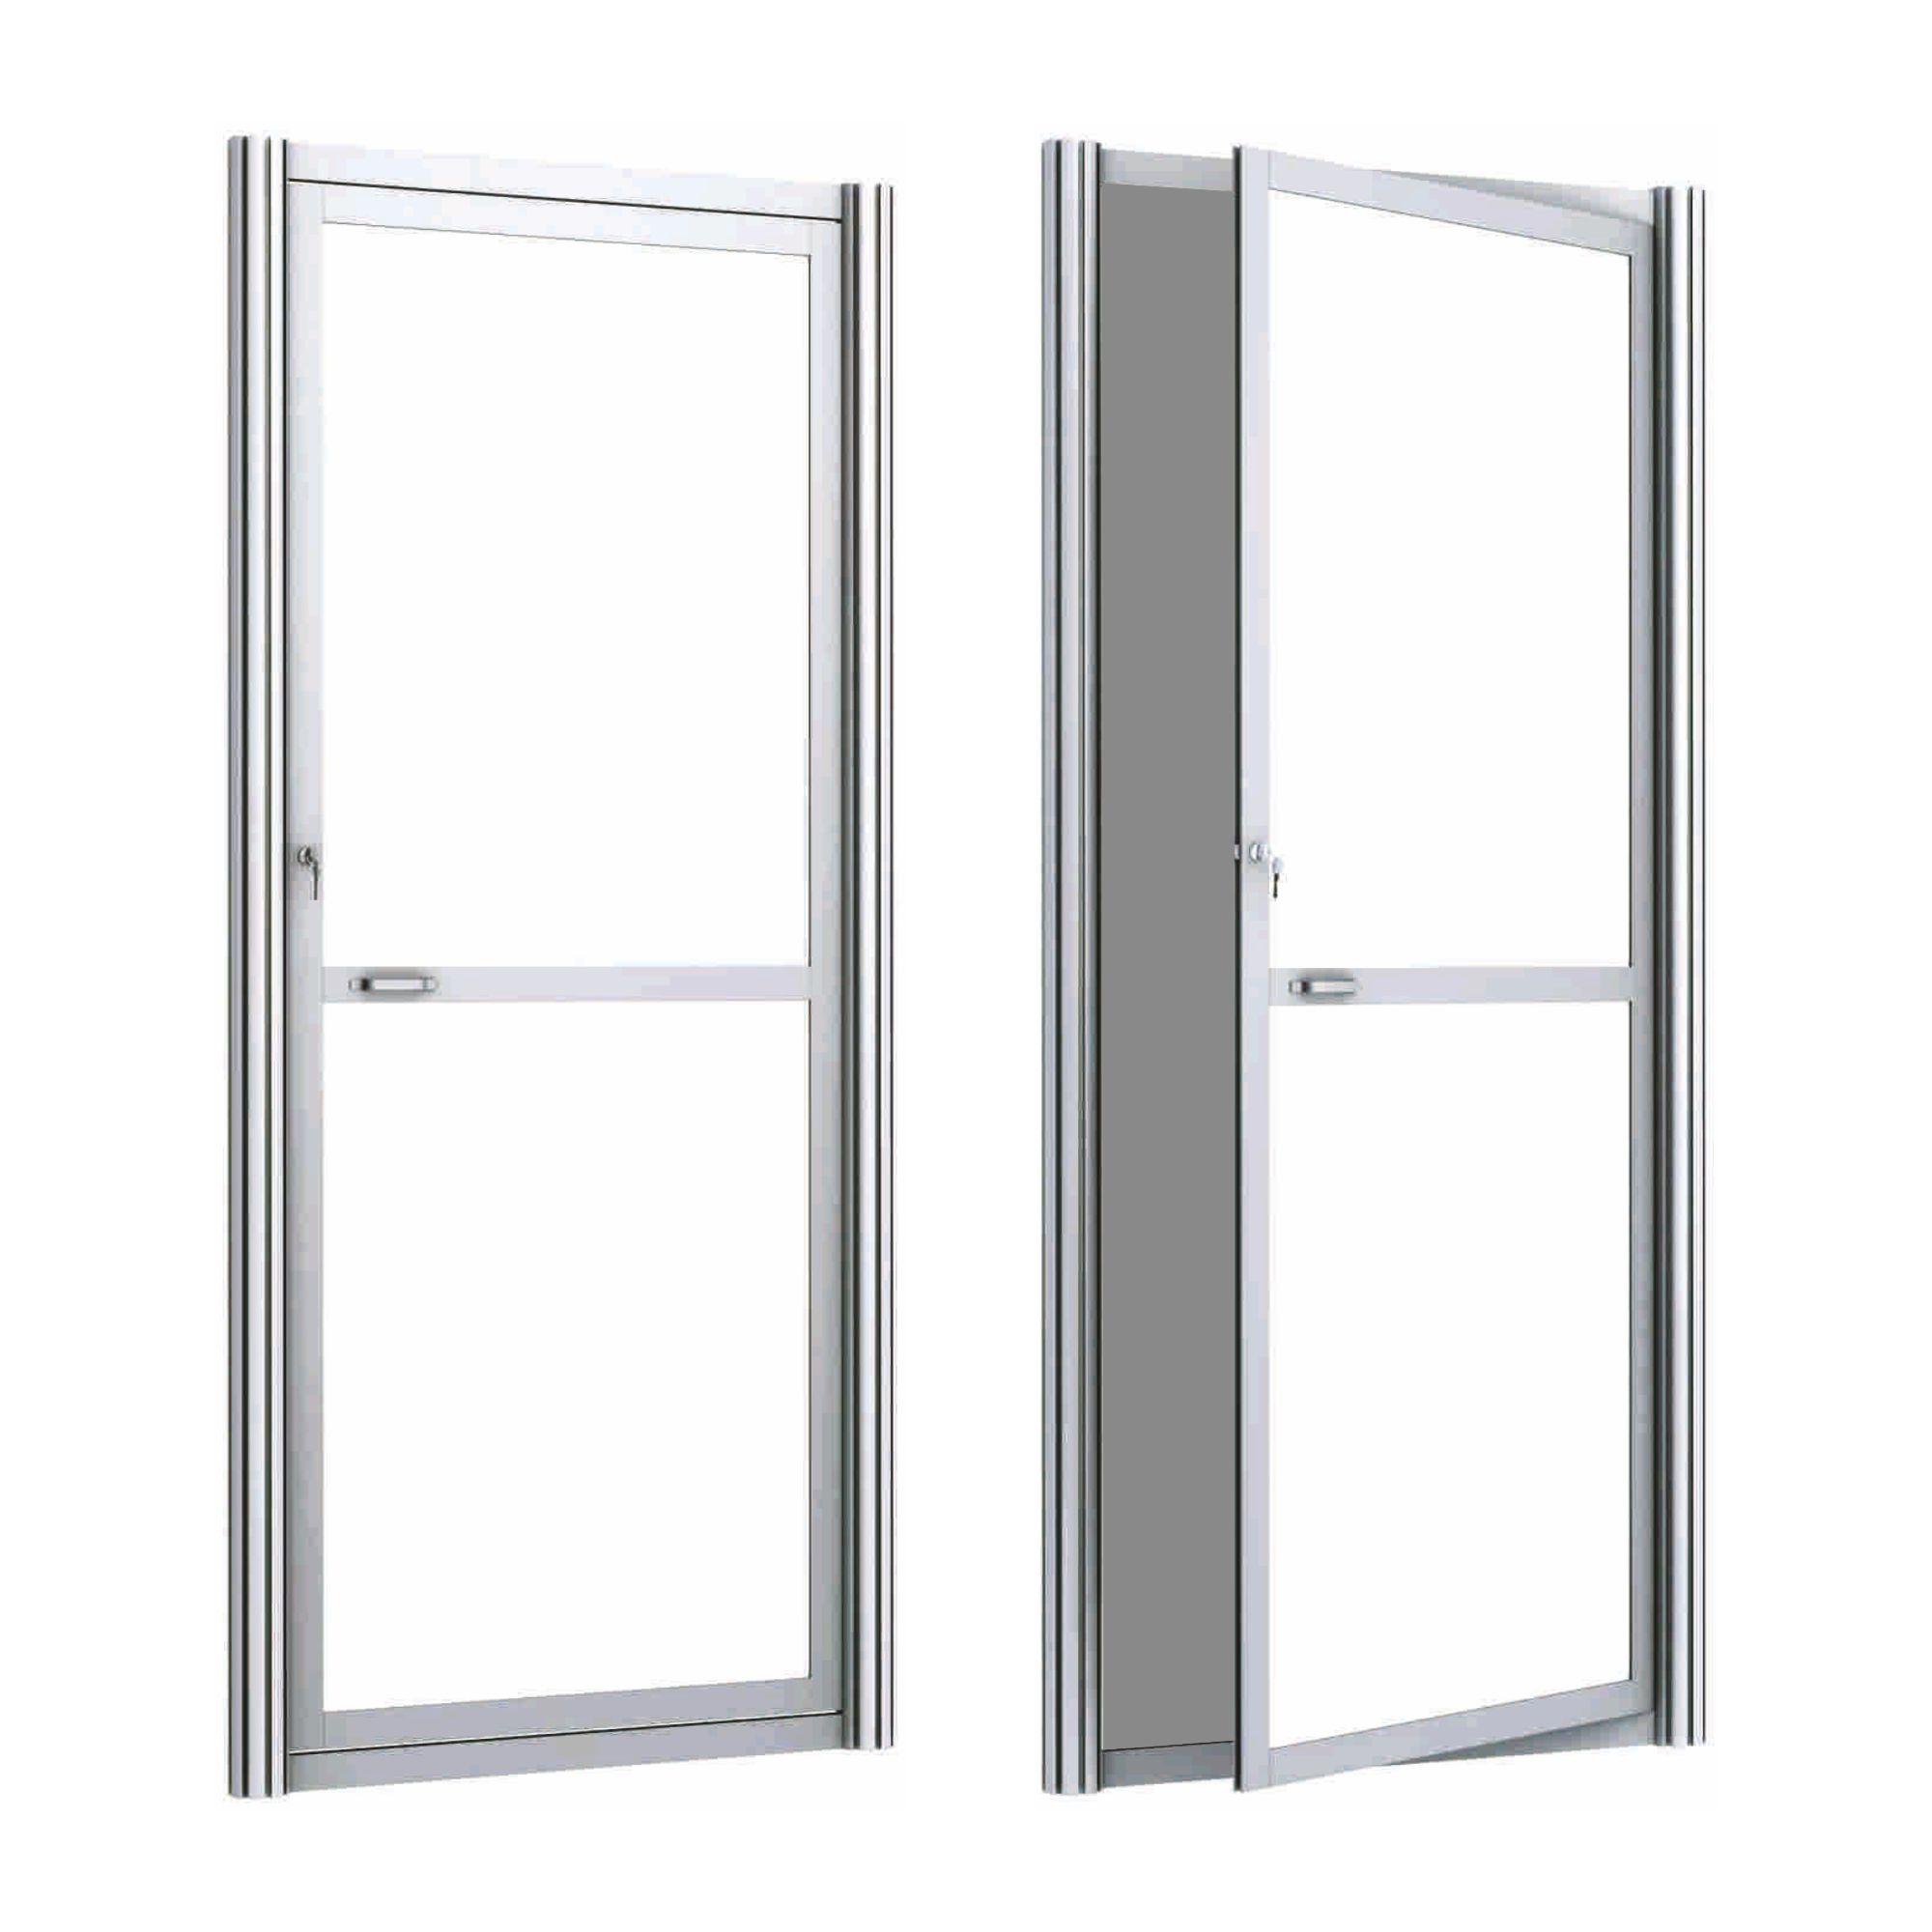 Stock Room Doors : Centro storeroom doors ores display systems